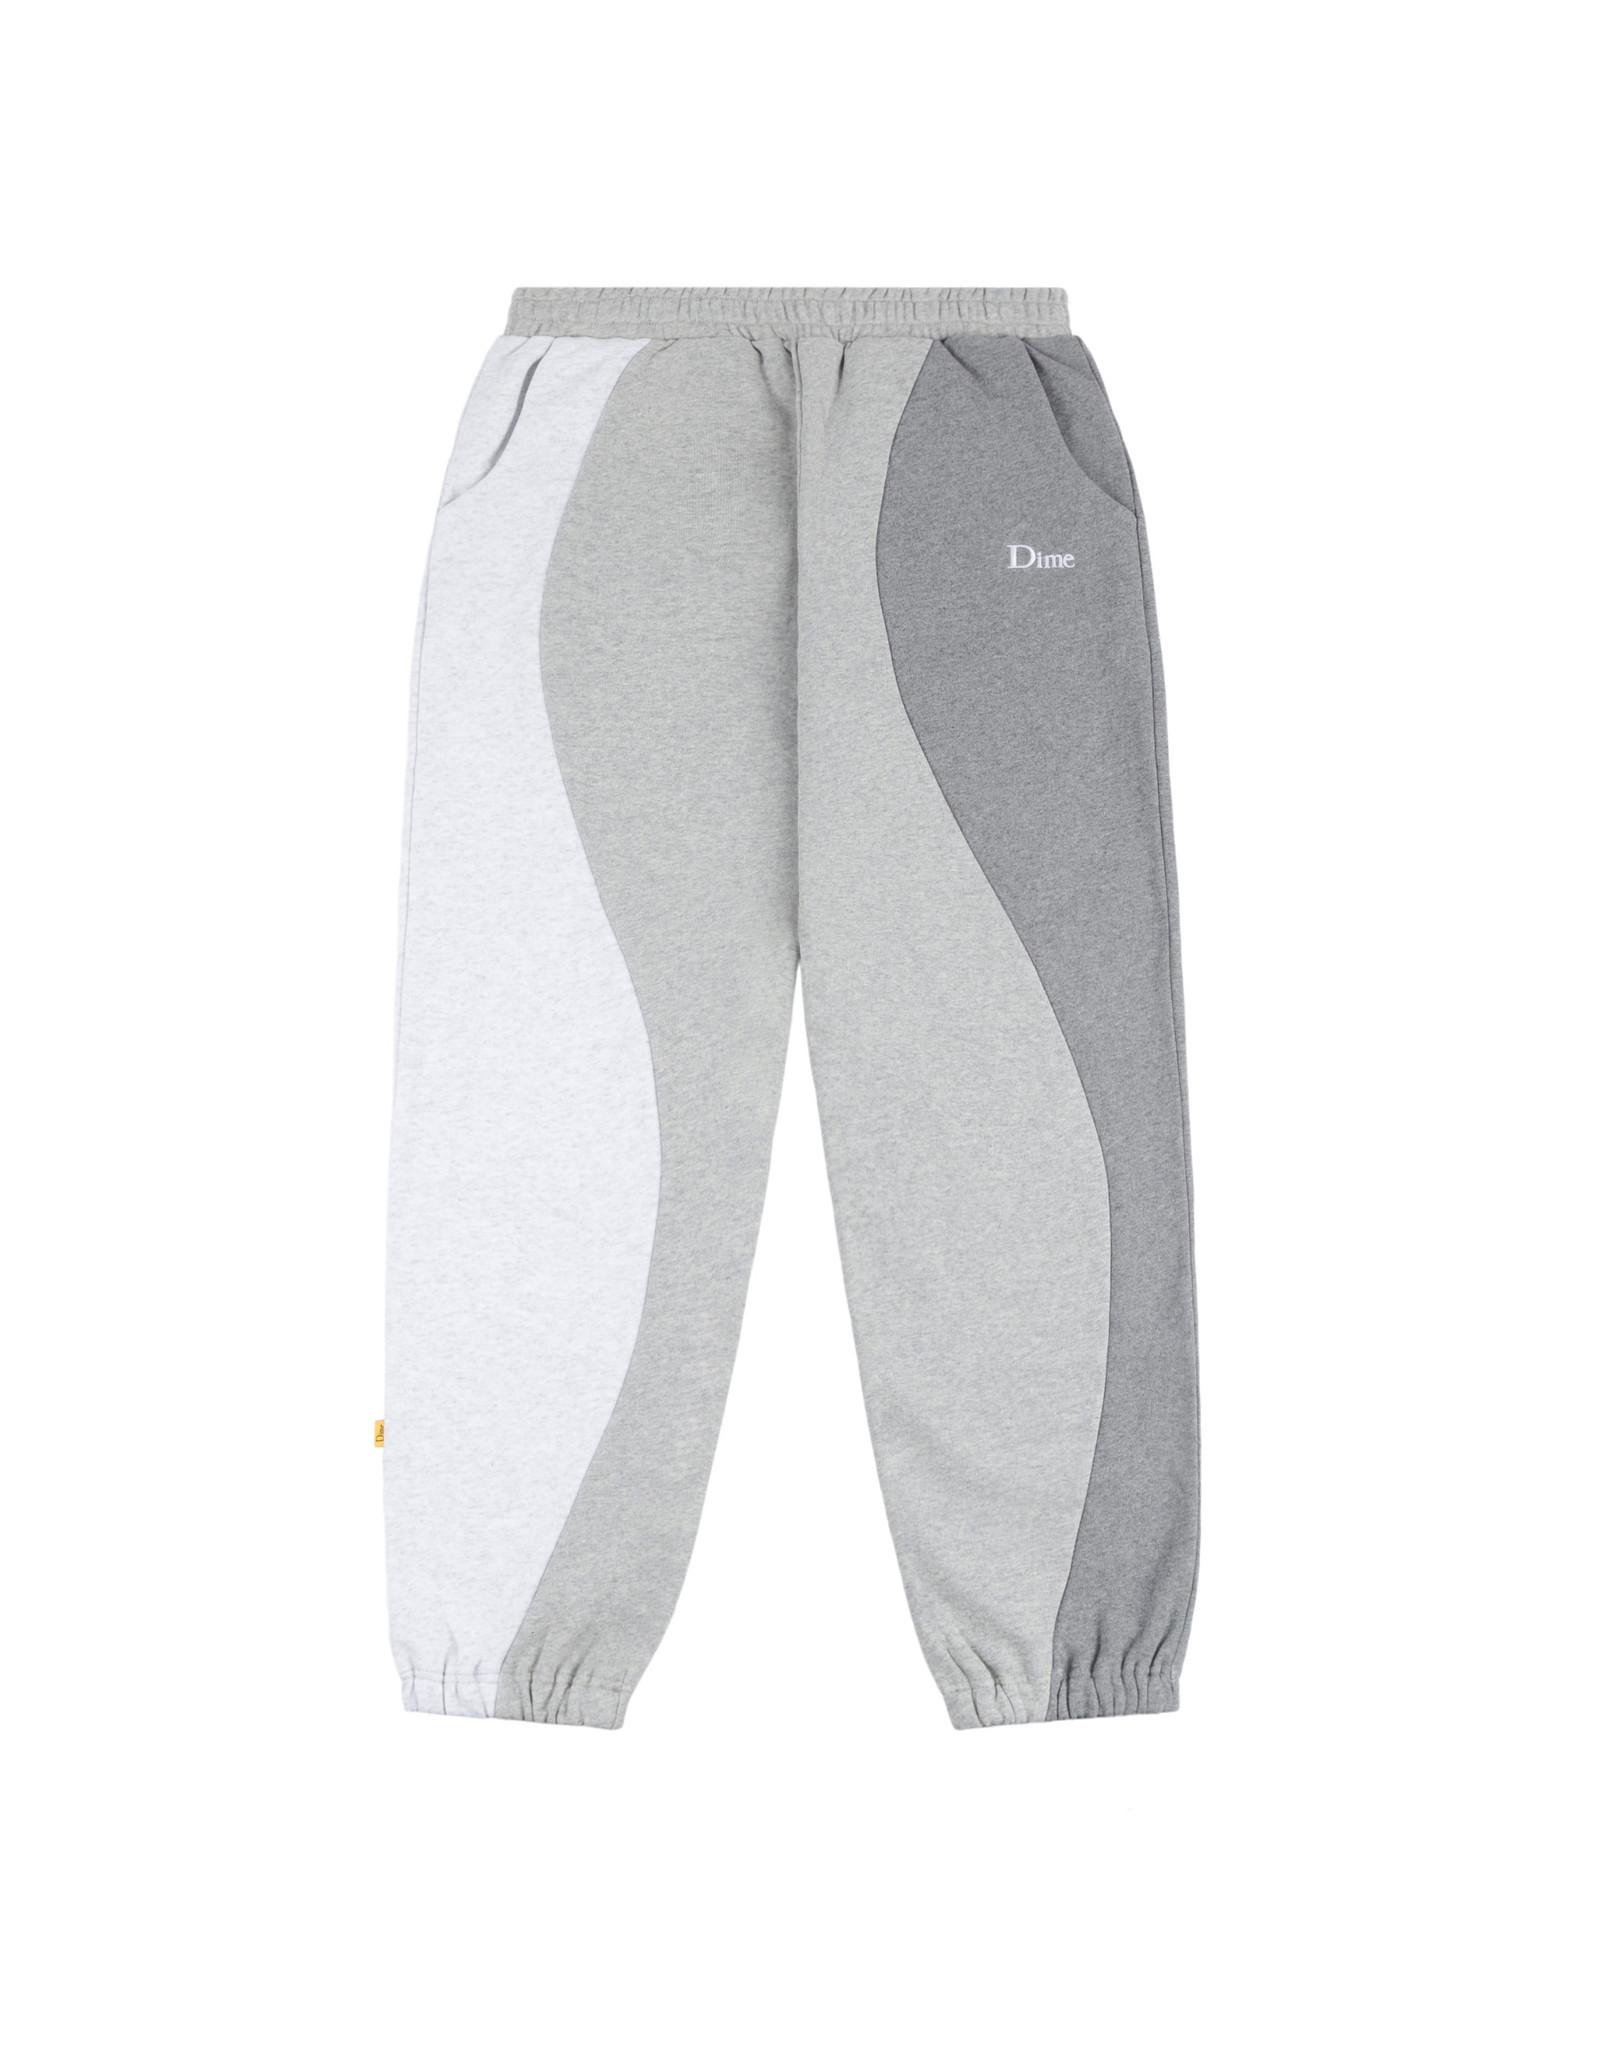 DIME Wavy 3-tone sweatpants